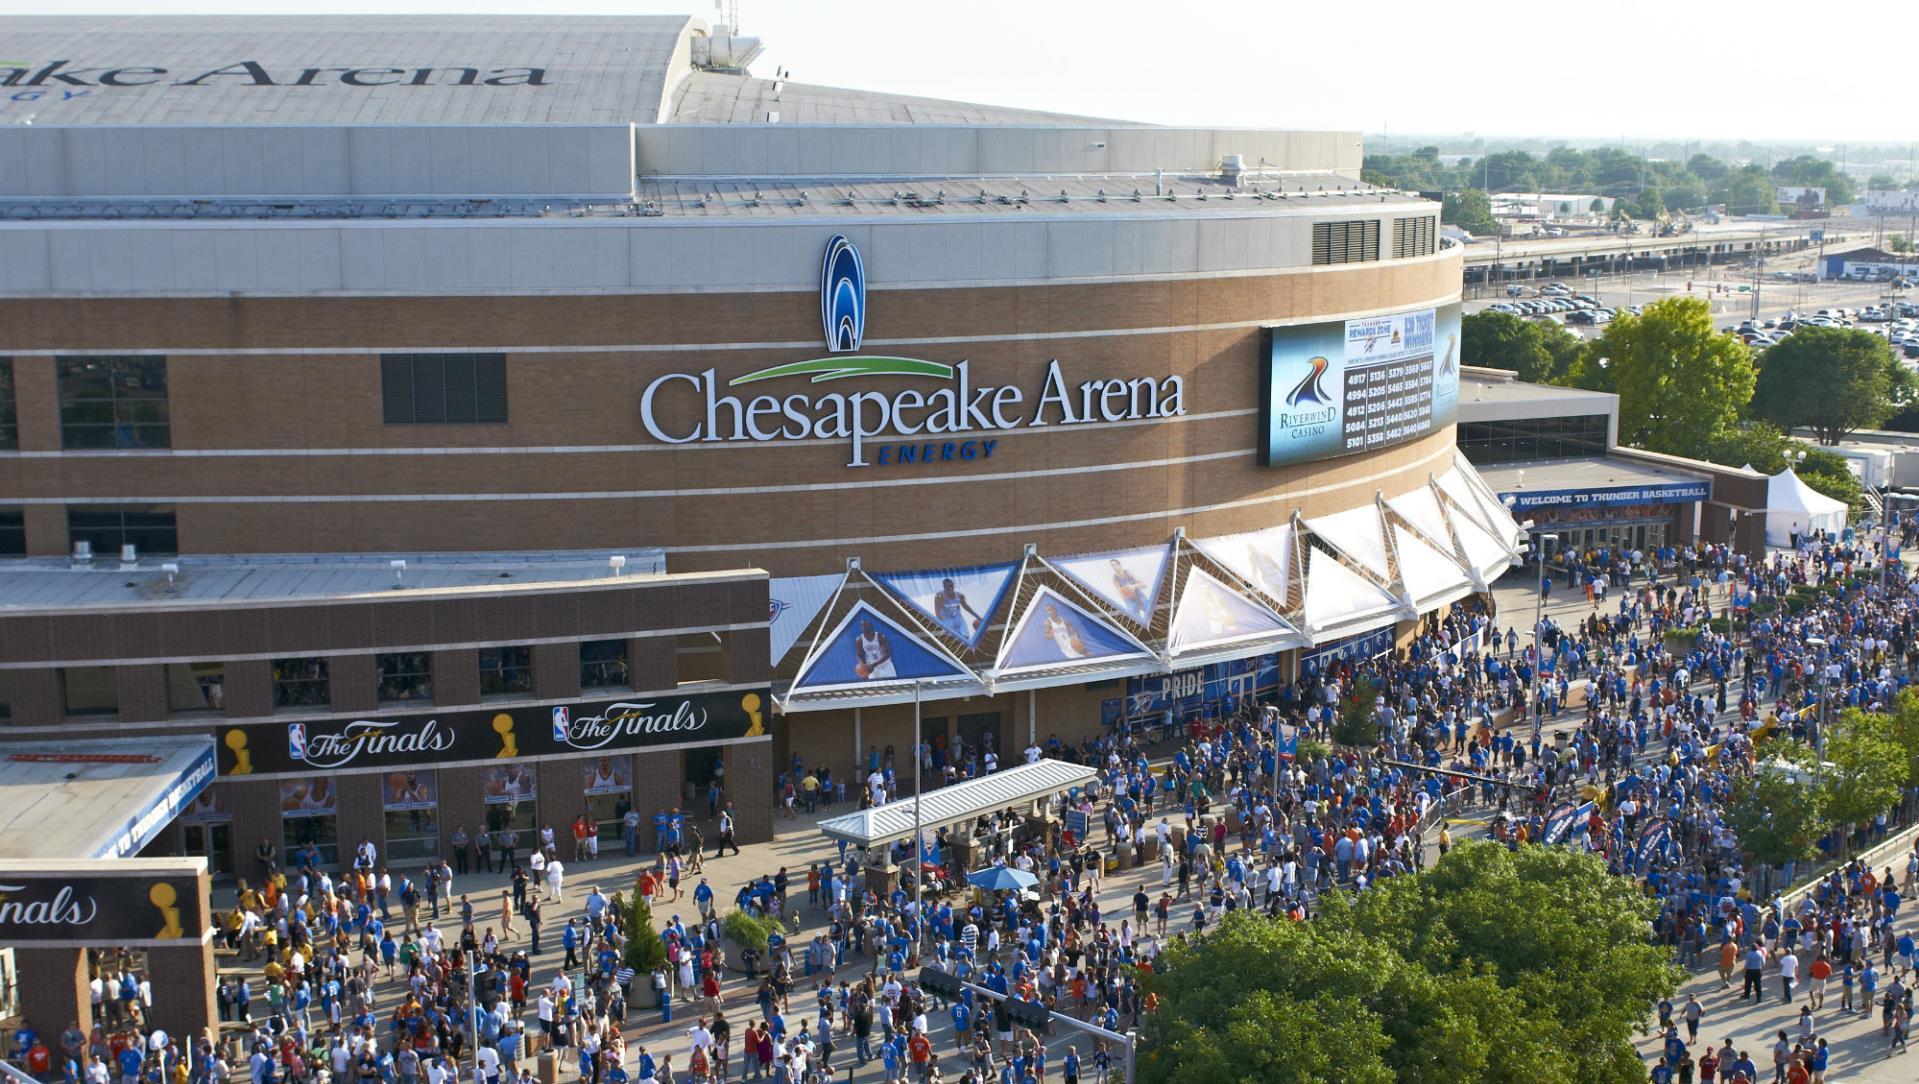 21 Fevrier 2017 - Chesapeake Energy Arena, Oklahoma City, OK, USA ShowImage?id=6928&t=635963248882270000